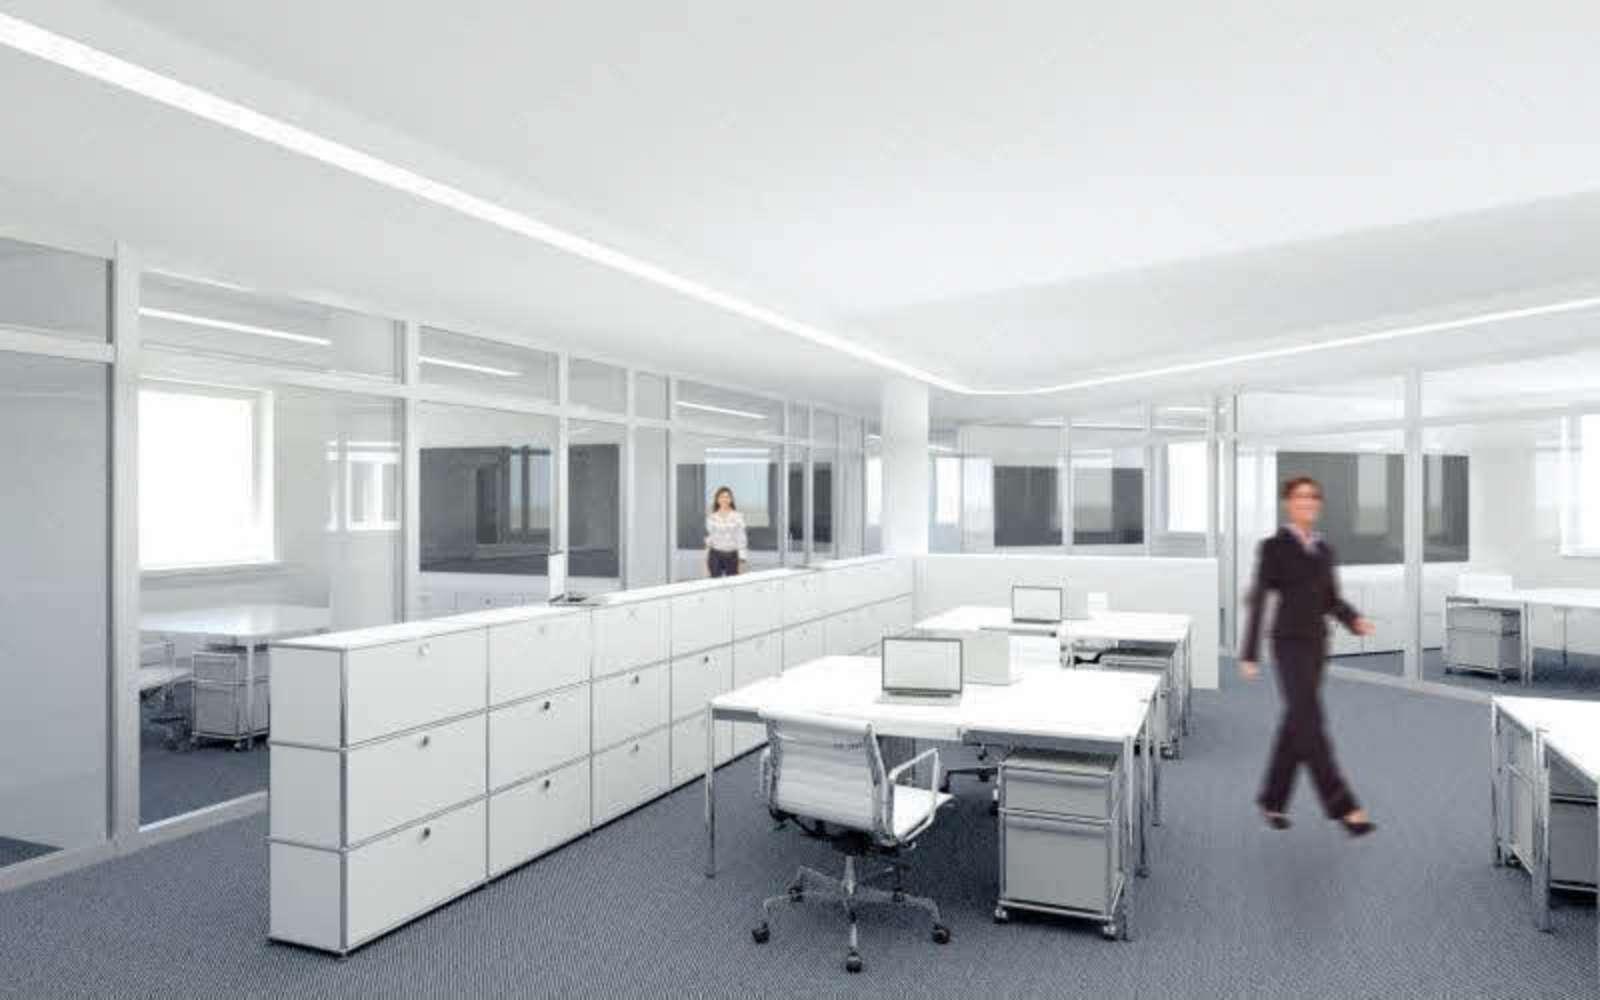 Büros Oberursel (taunus), 61440 - Büro - Oberursel (Taunus), Stierstadt - F1529 - 9419210